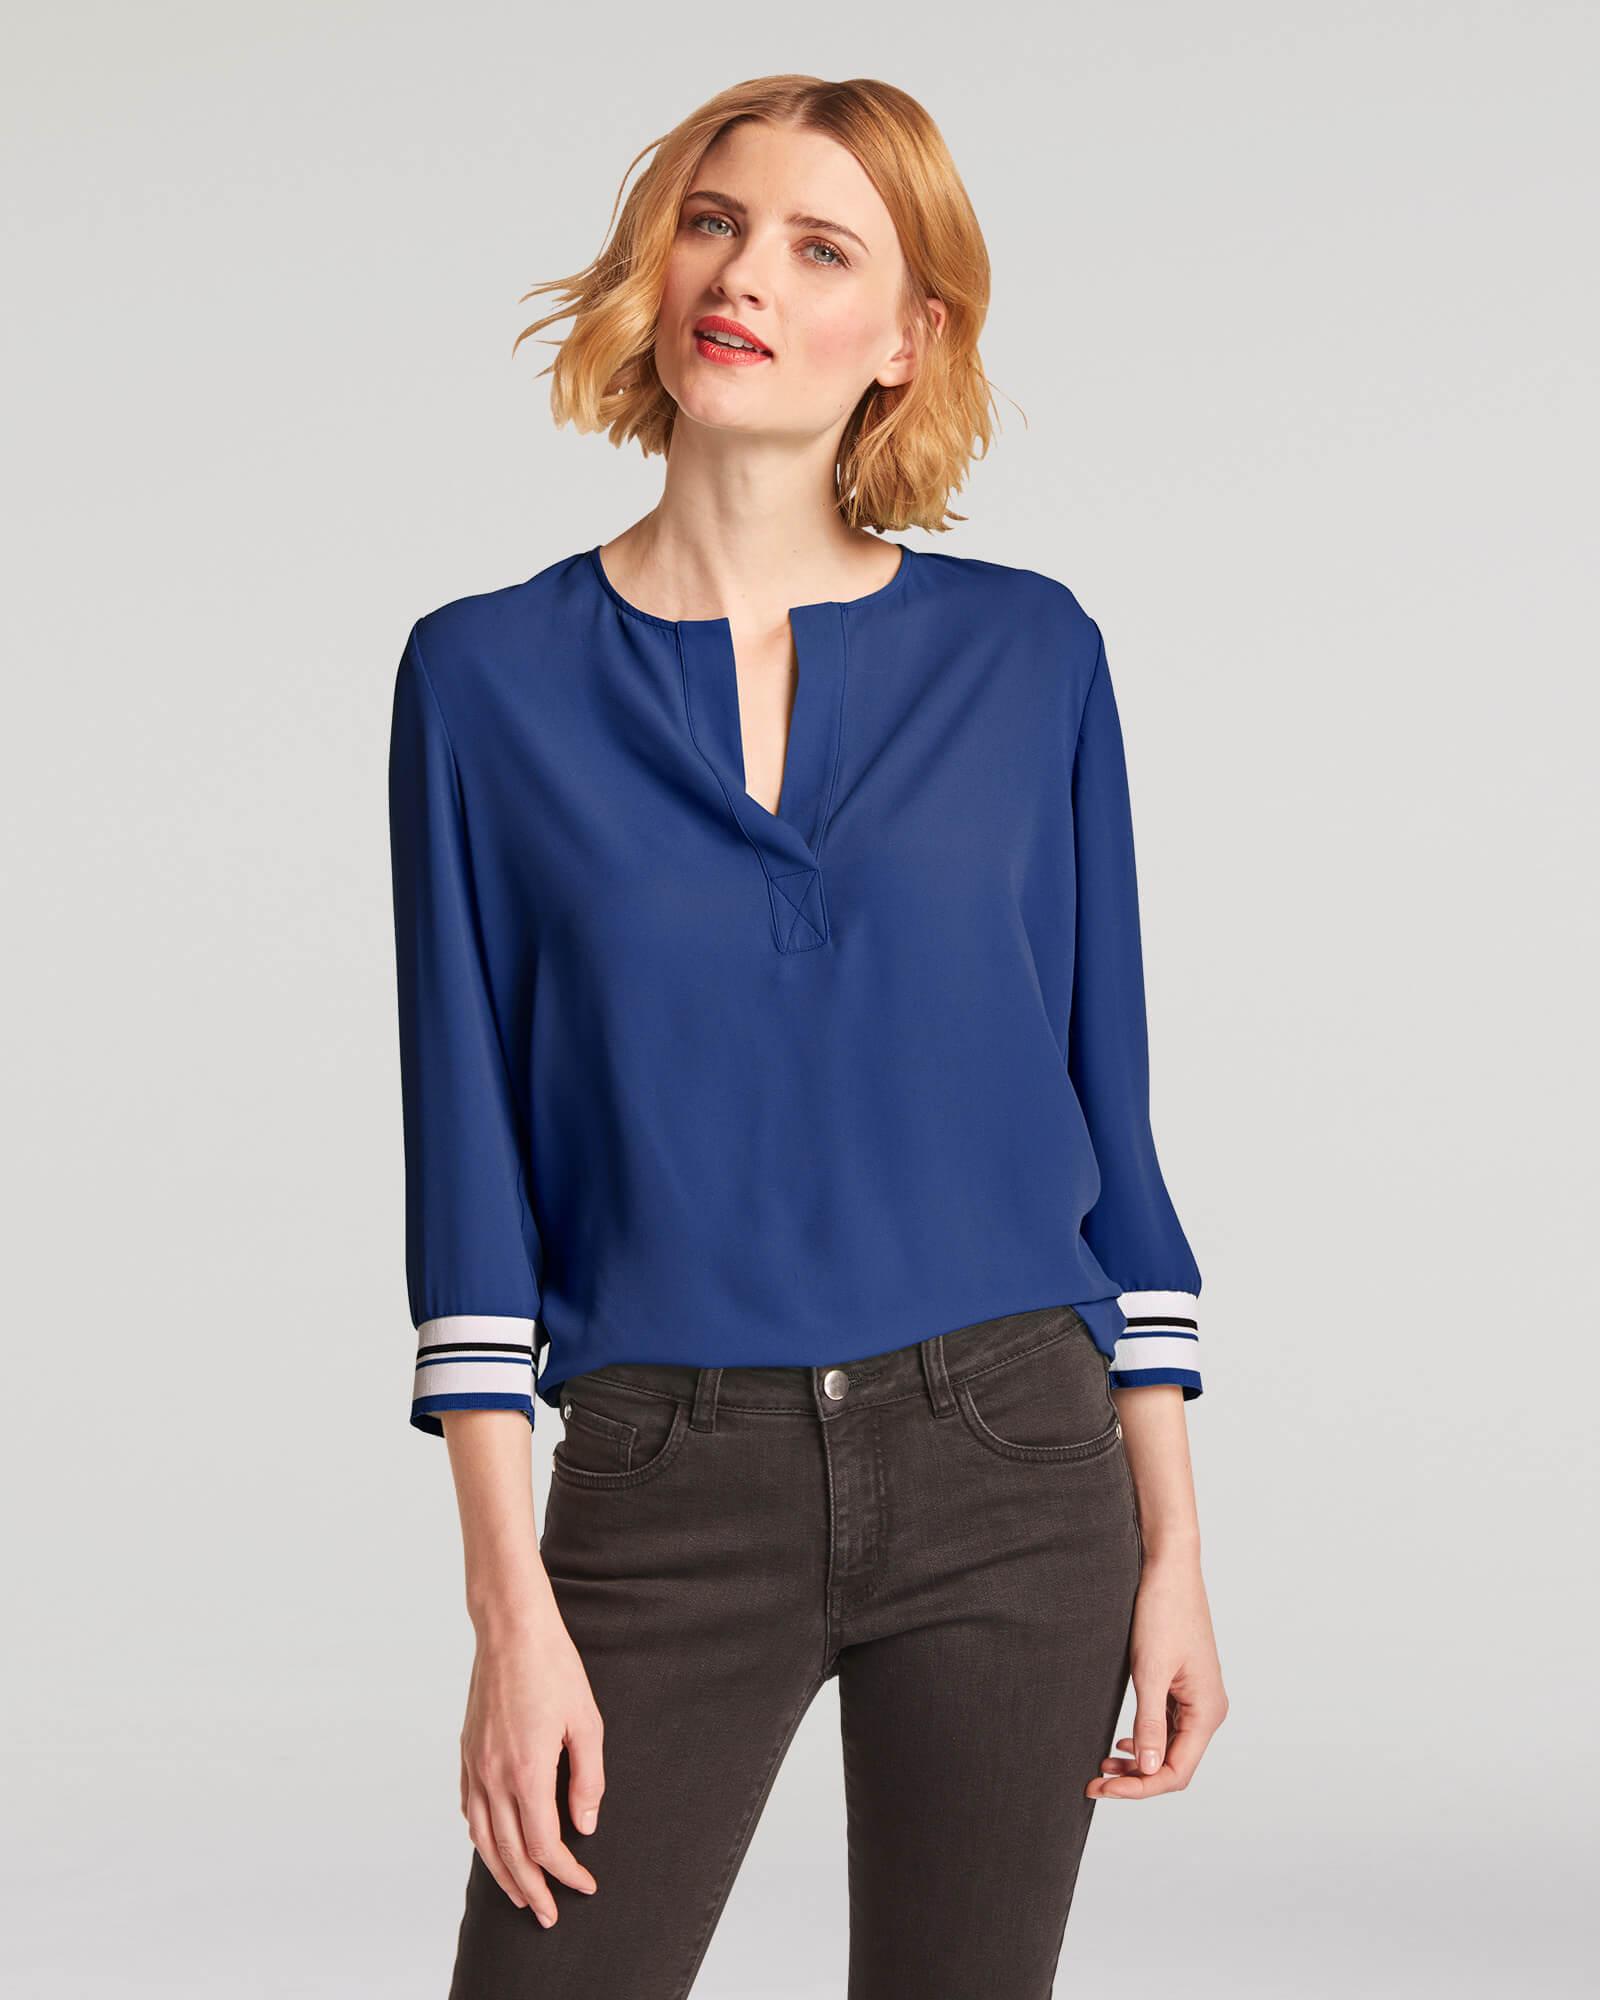 sportliche Bluse Blau